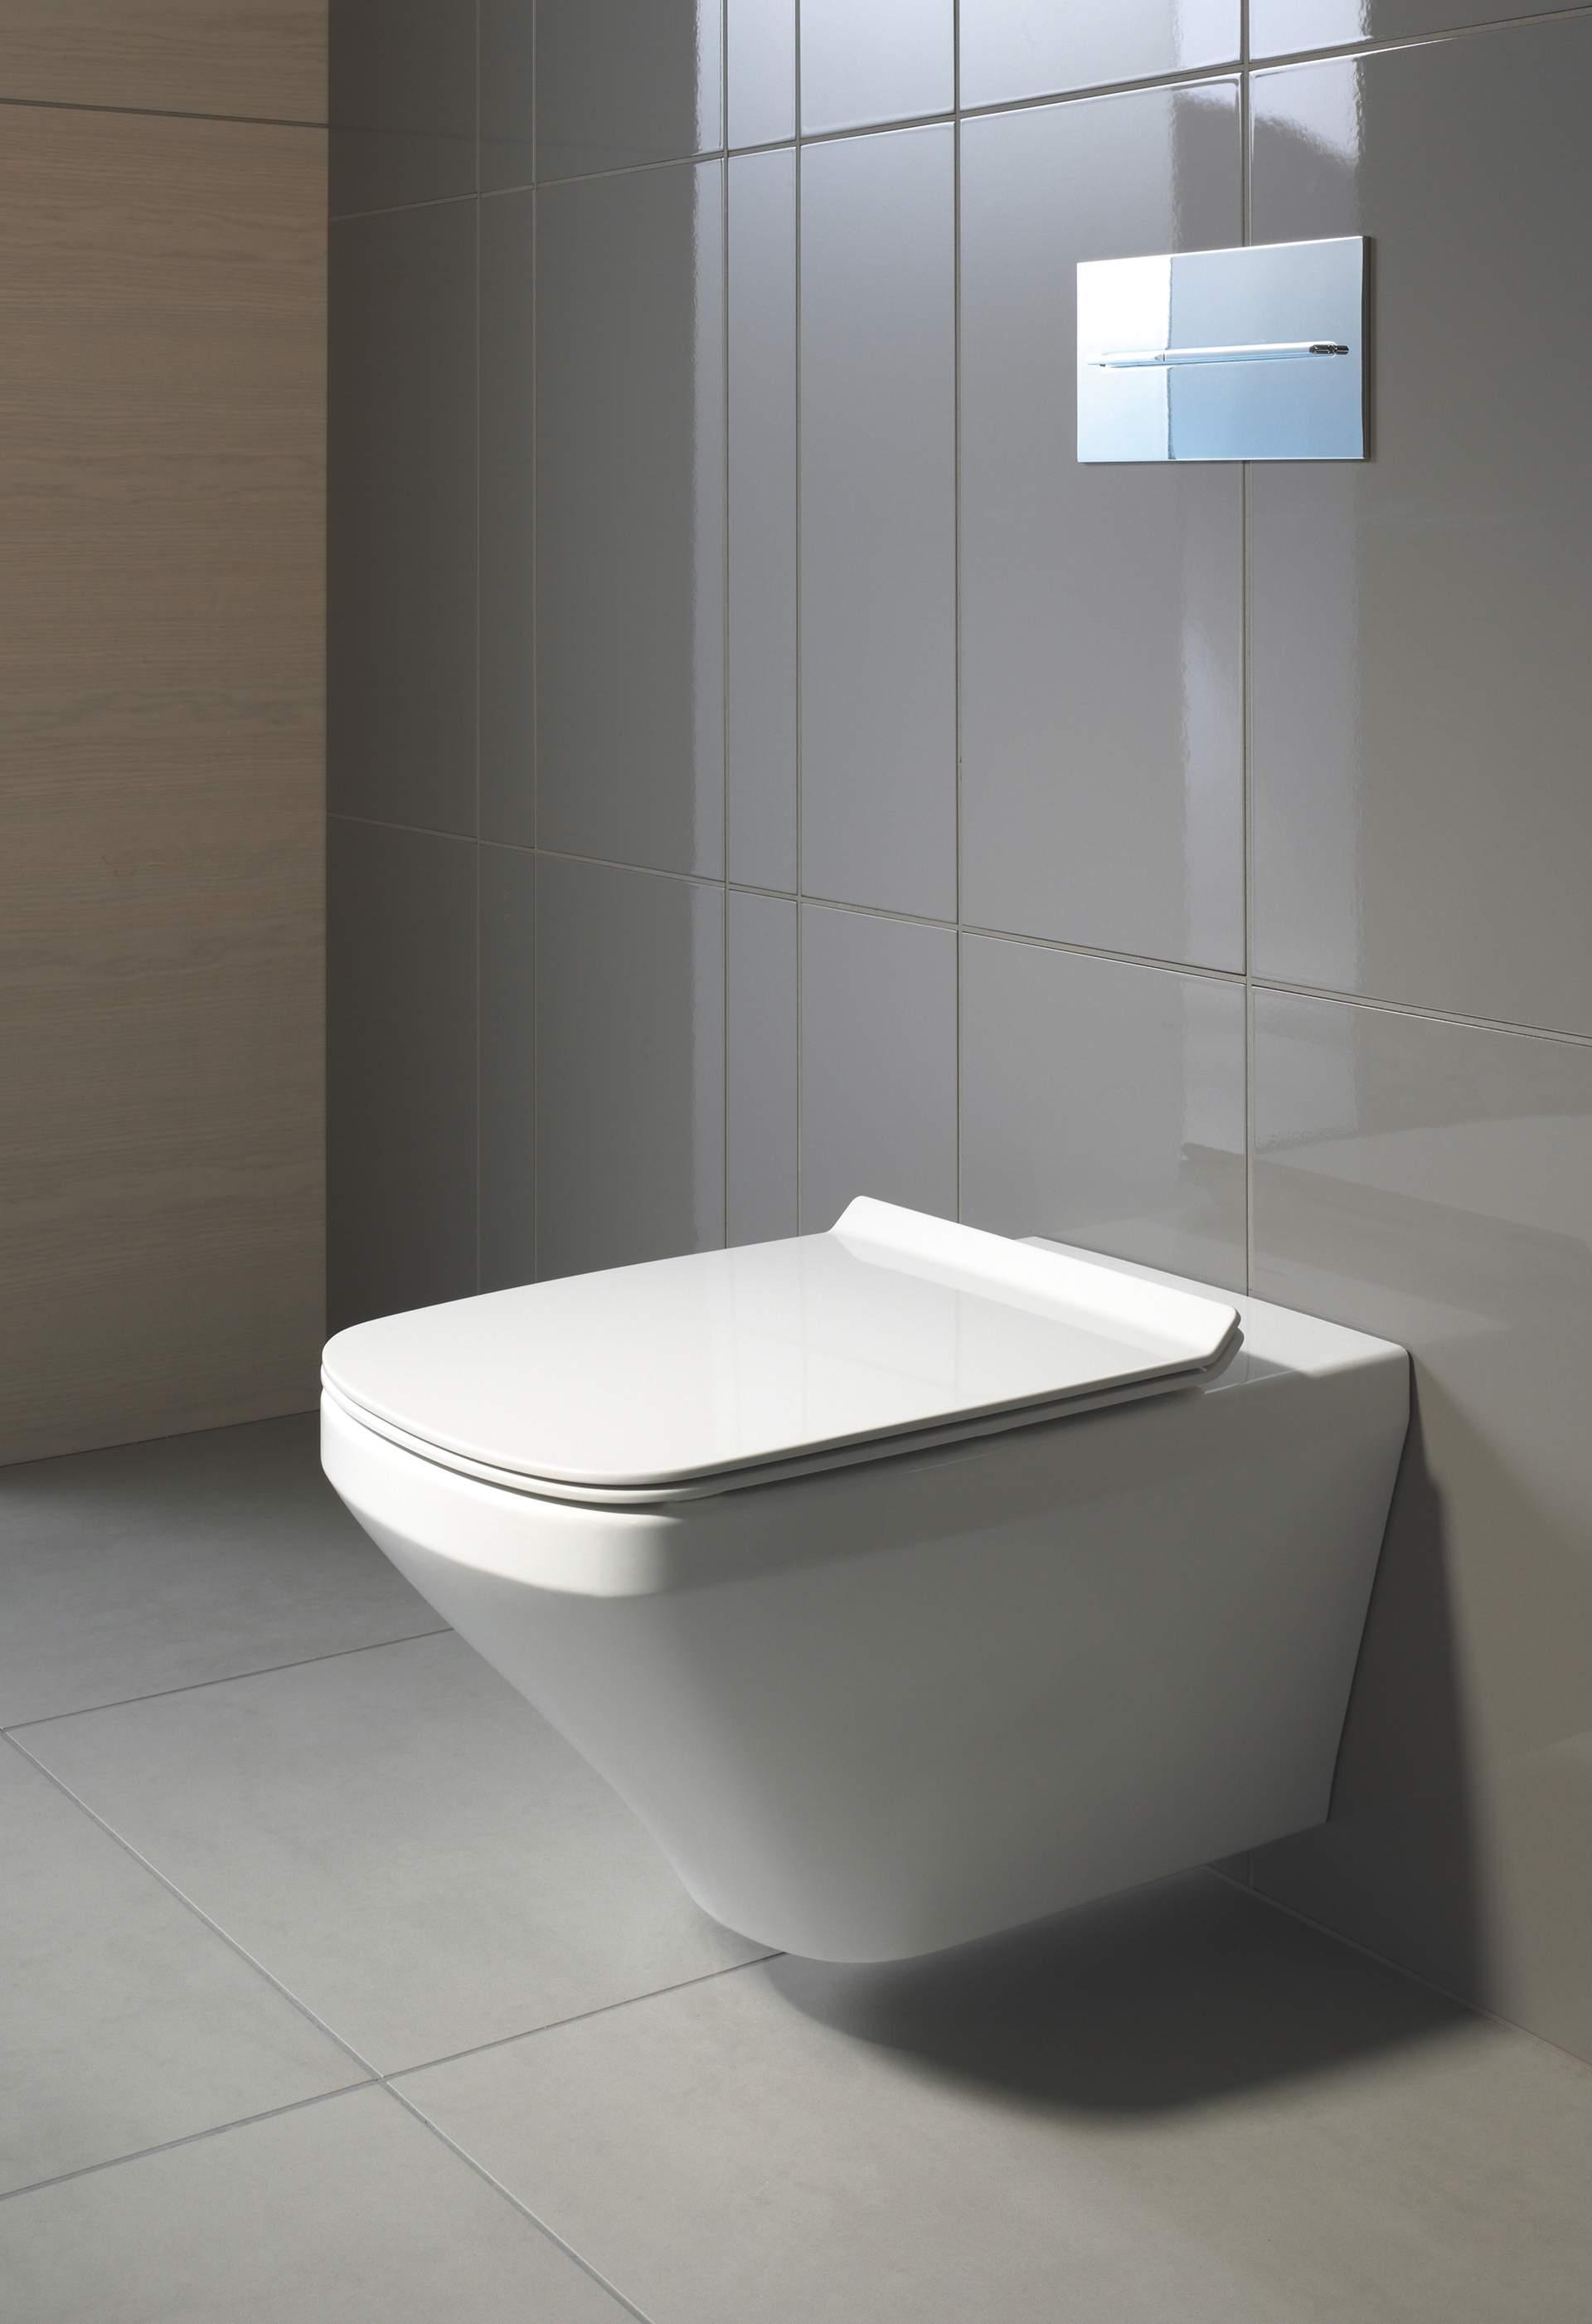 Duravit Bathrooms the best toilet of duravit   duravit